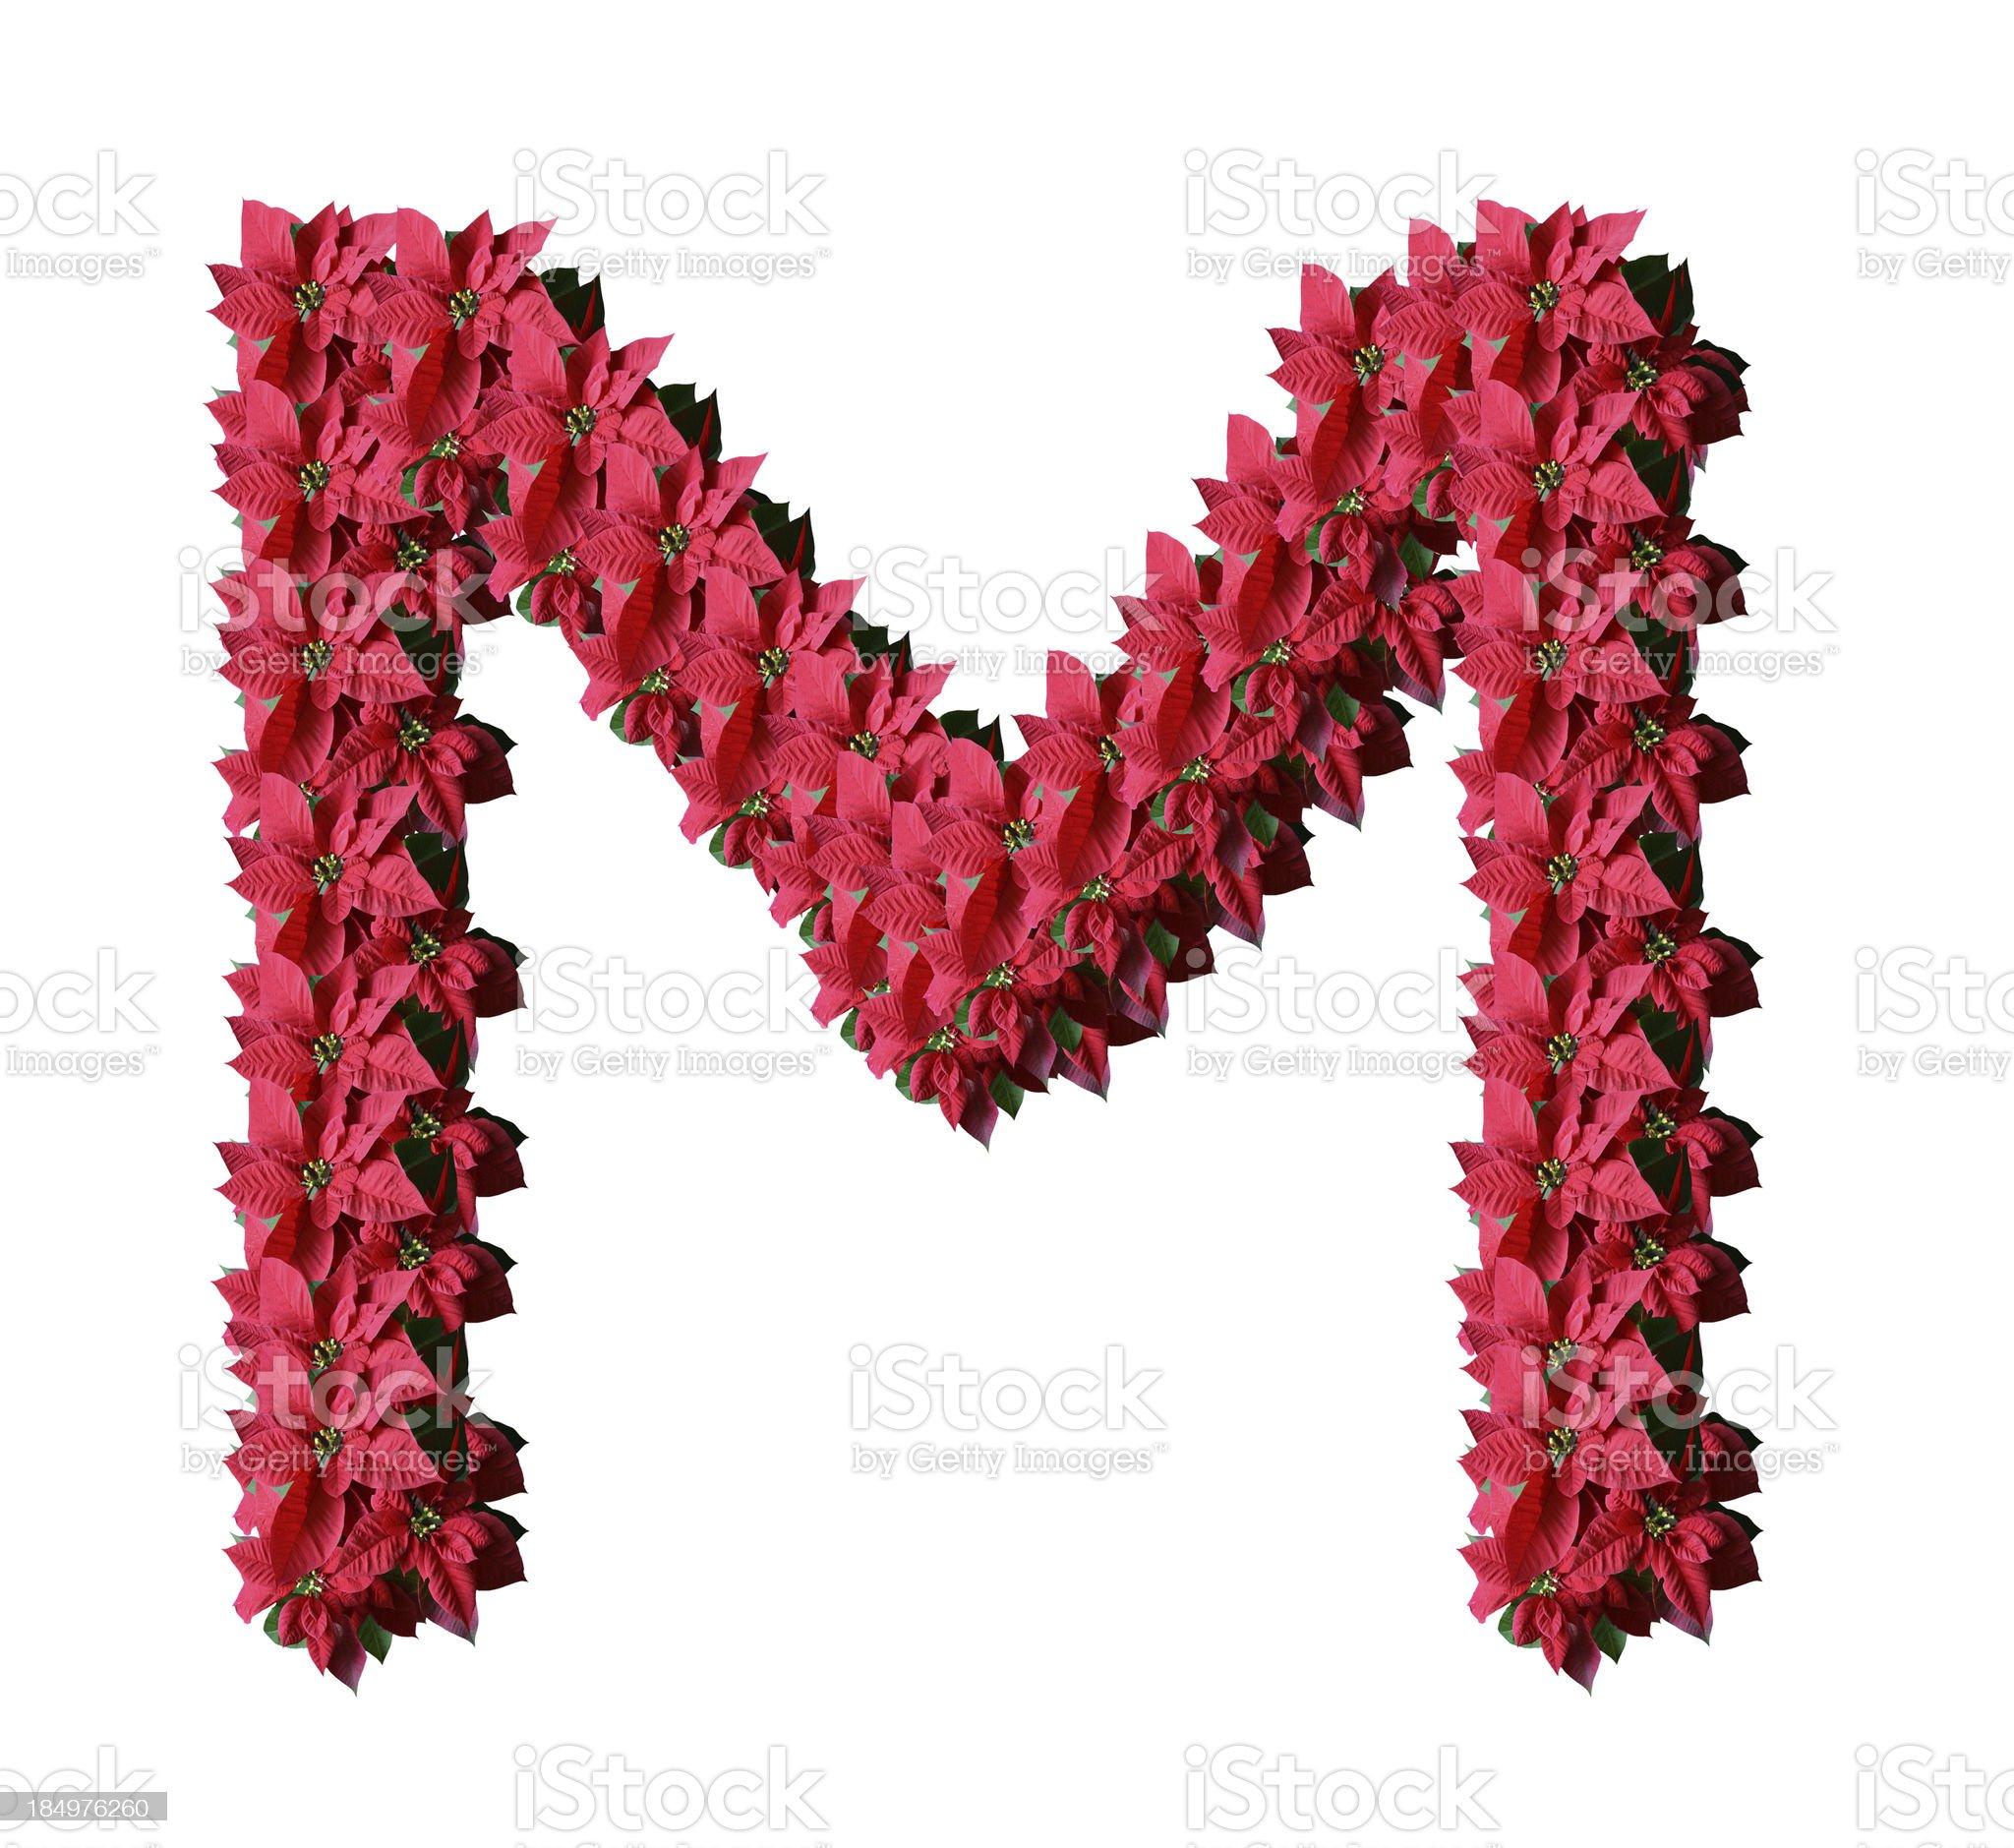 Poinsetia letter M royalty-free stock photo